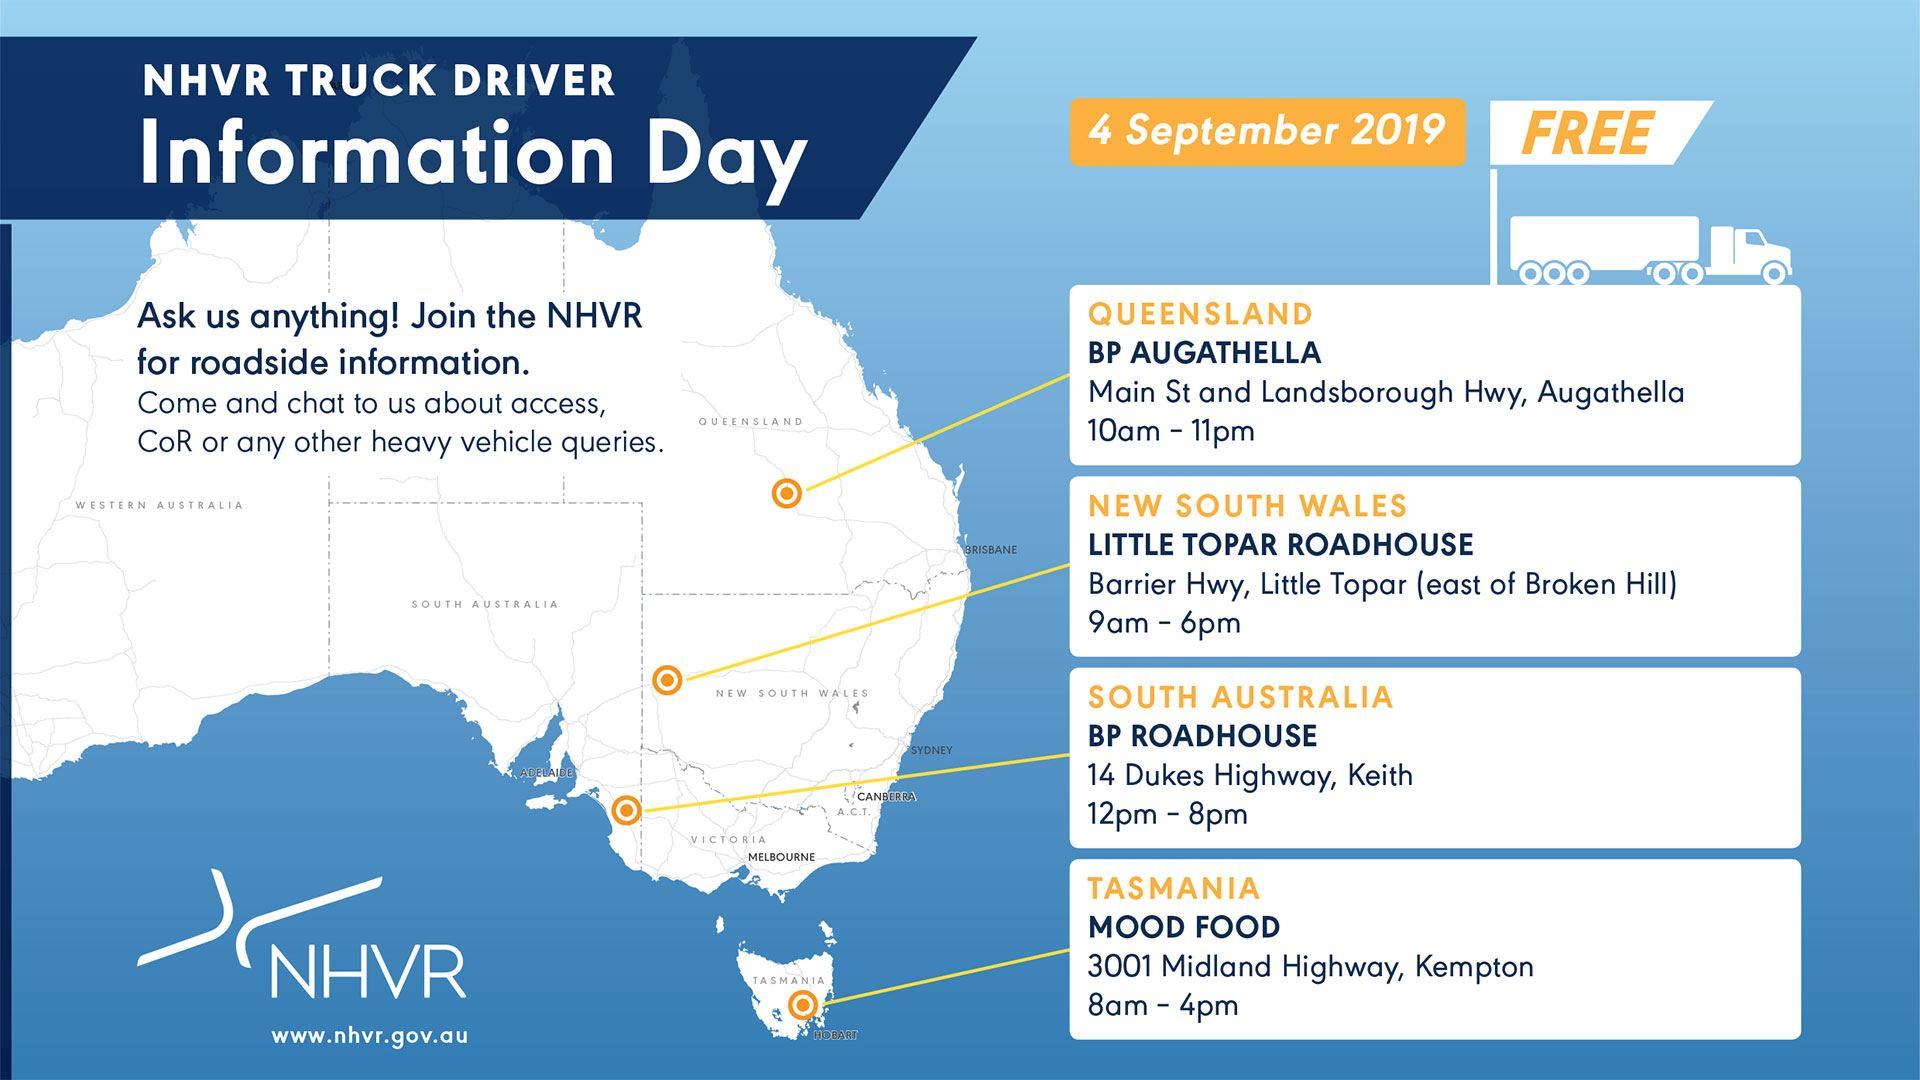 SCLAA – Supply Chain & Logistics Association of Australia